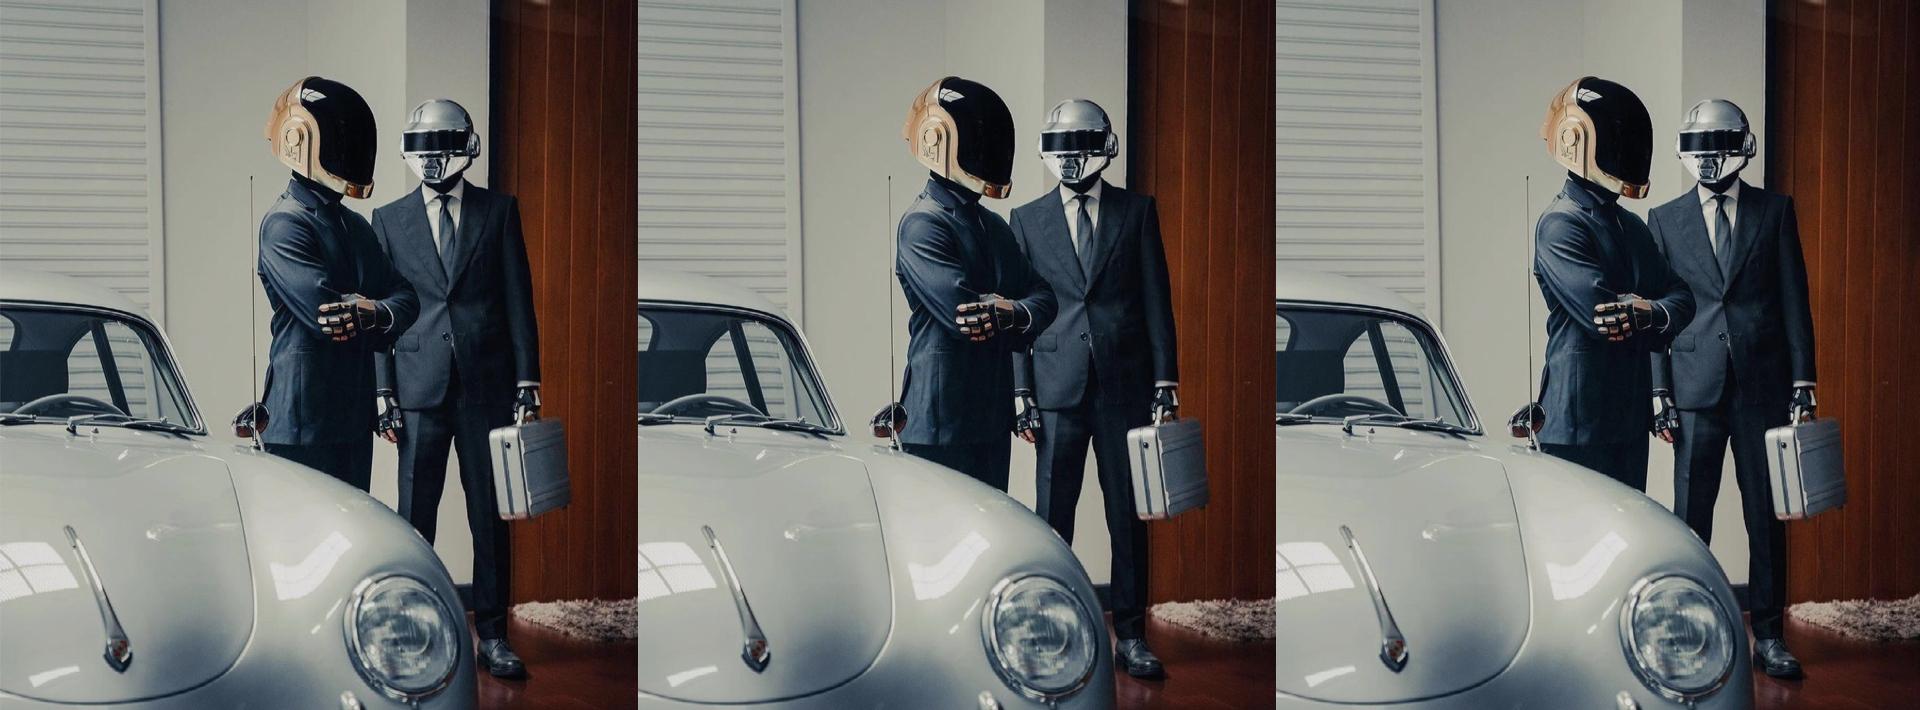 🤖 Random access memories: Daft Punk tribute shot by Calvin Courjon in Bangkok.